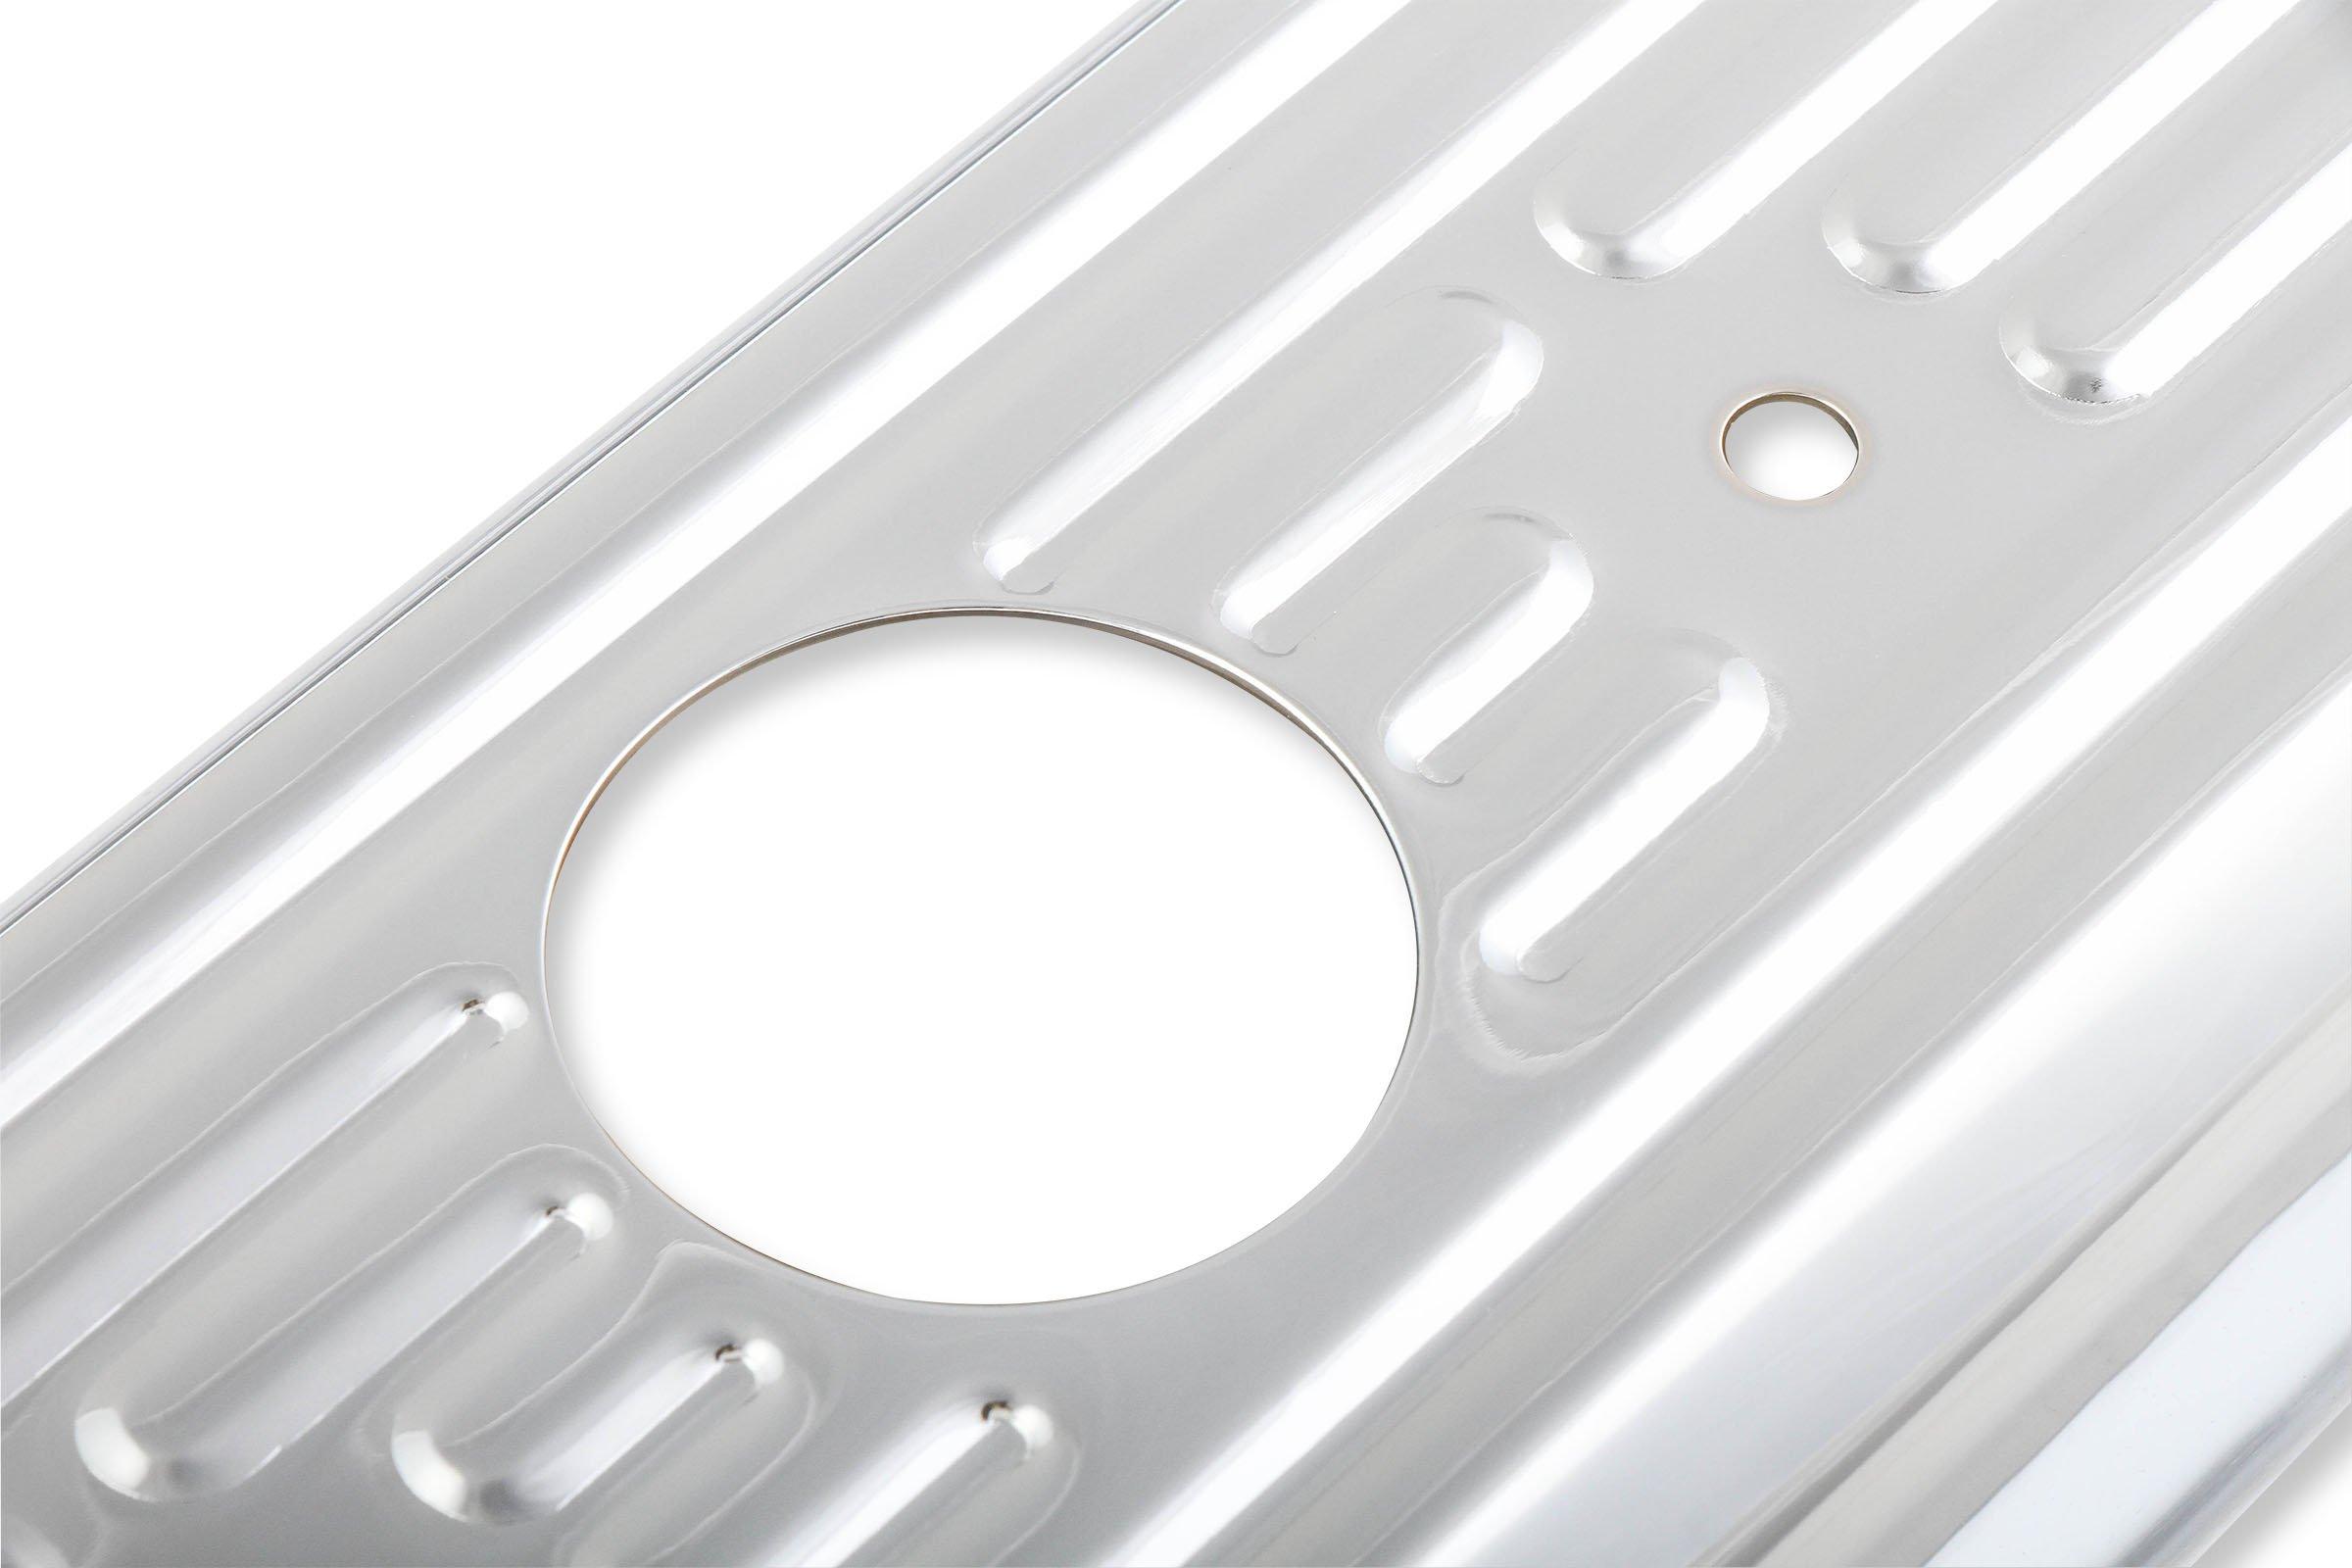 Gasket 9847 Chrome Plated Valve Cover Cap Mr